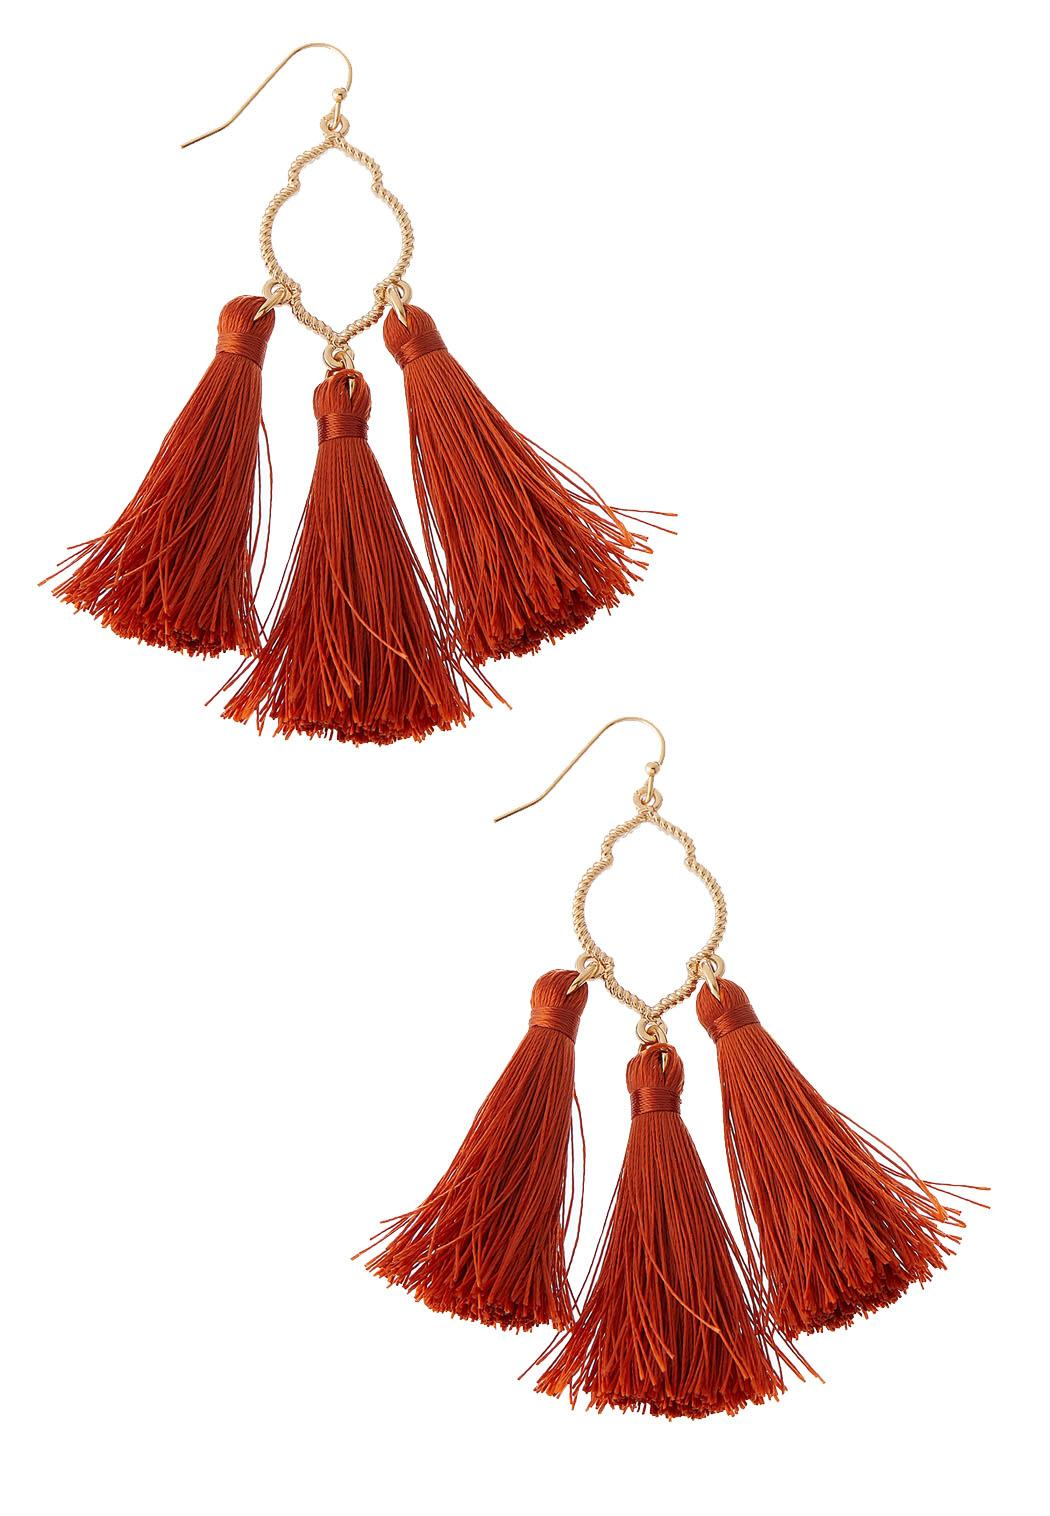 Cutout Metal Tassel Earrings